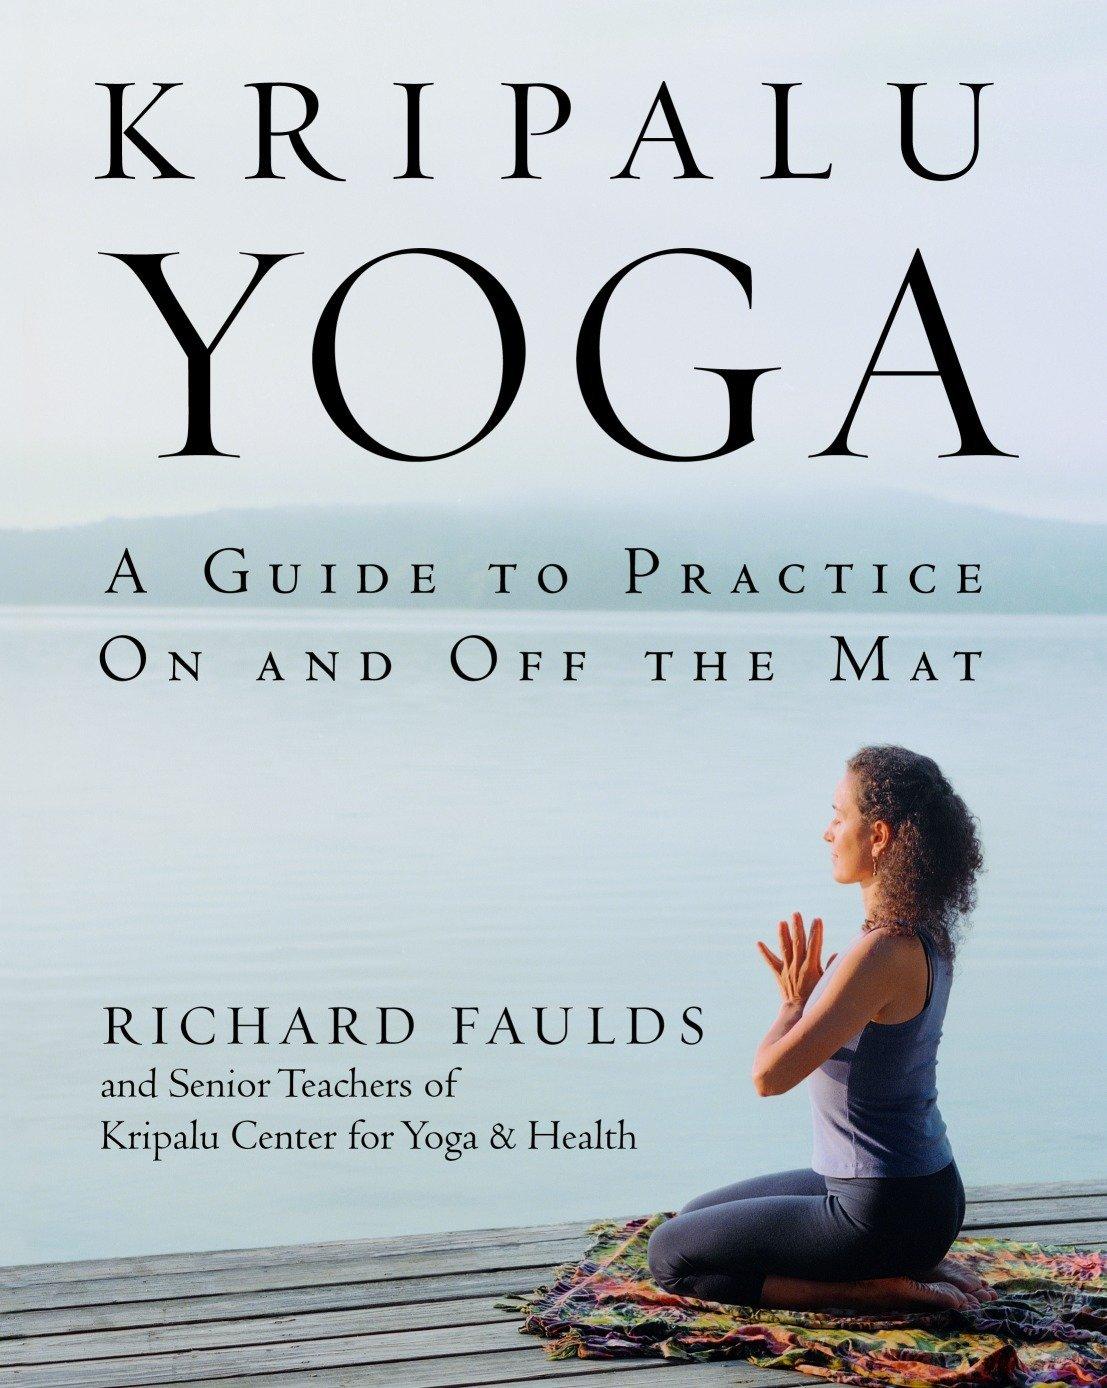 Kripalu Yoga: A Guide to Practice On and Off the Mat: Richard Faulds,  Senior Teaching Staff of Kripalu Center, Robert Bull, Paul Conrath:  9780553380972: ...